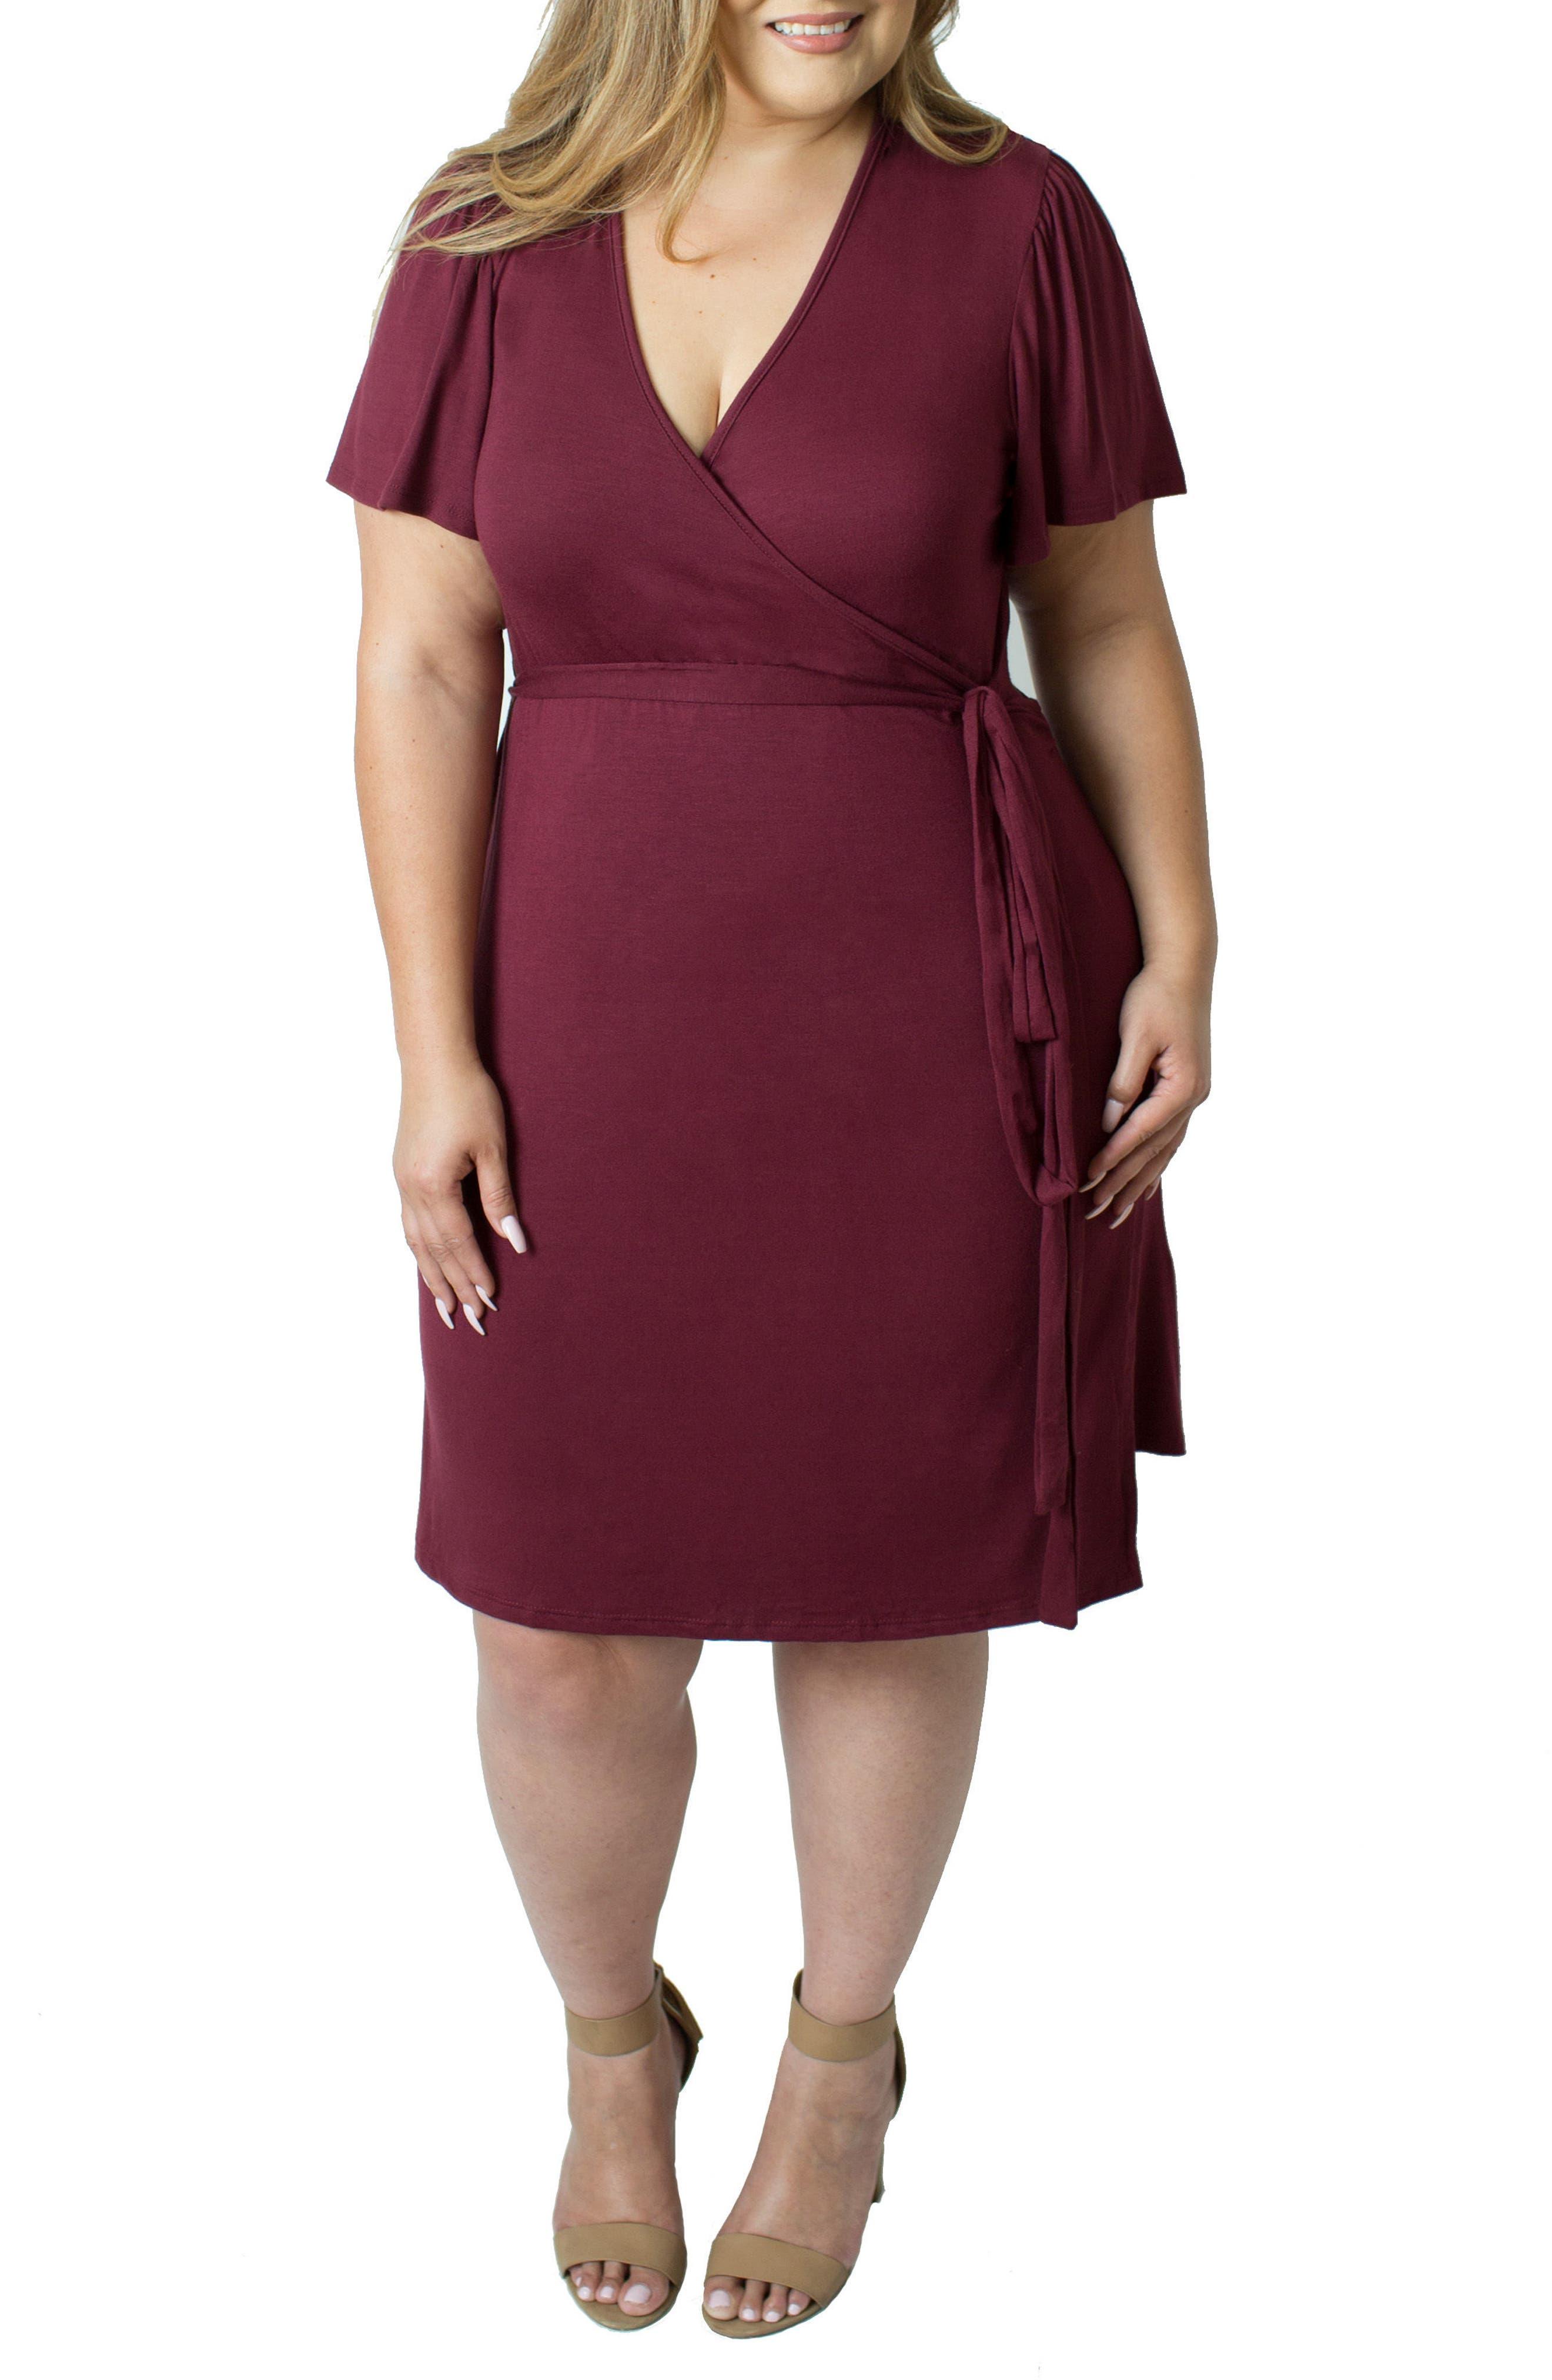 Wrap Nursing Dress,                             Main thumbnail 1, color,                             Red